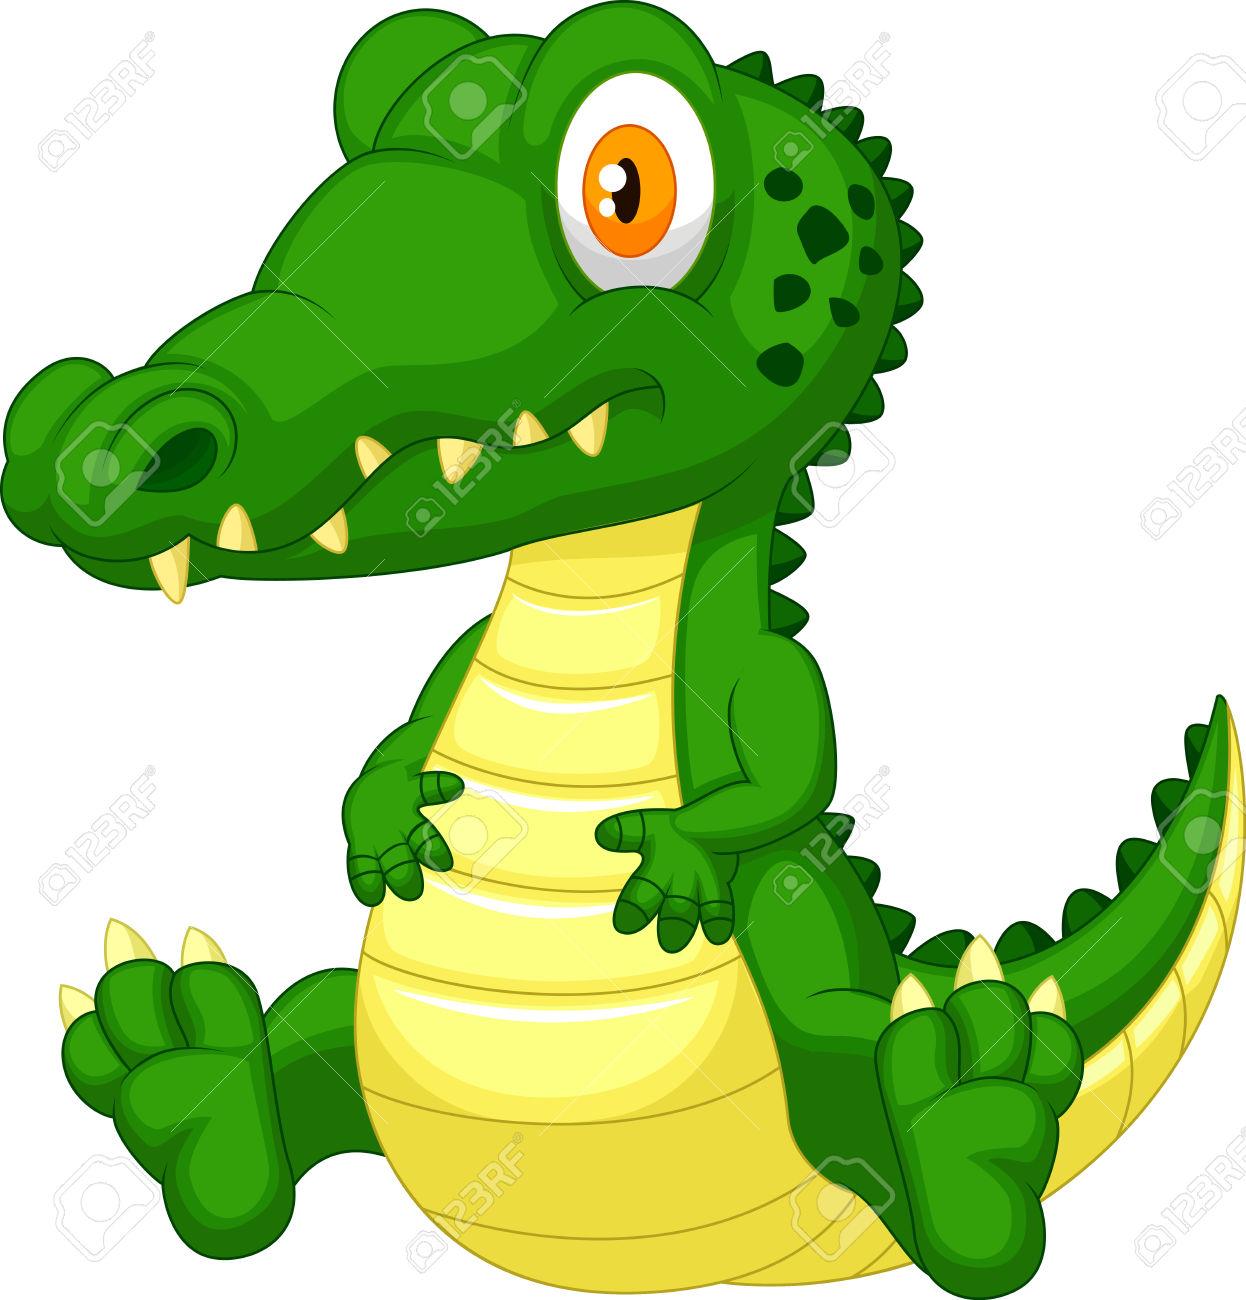 1246x1300 Crocodile Clipart Friendly